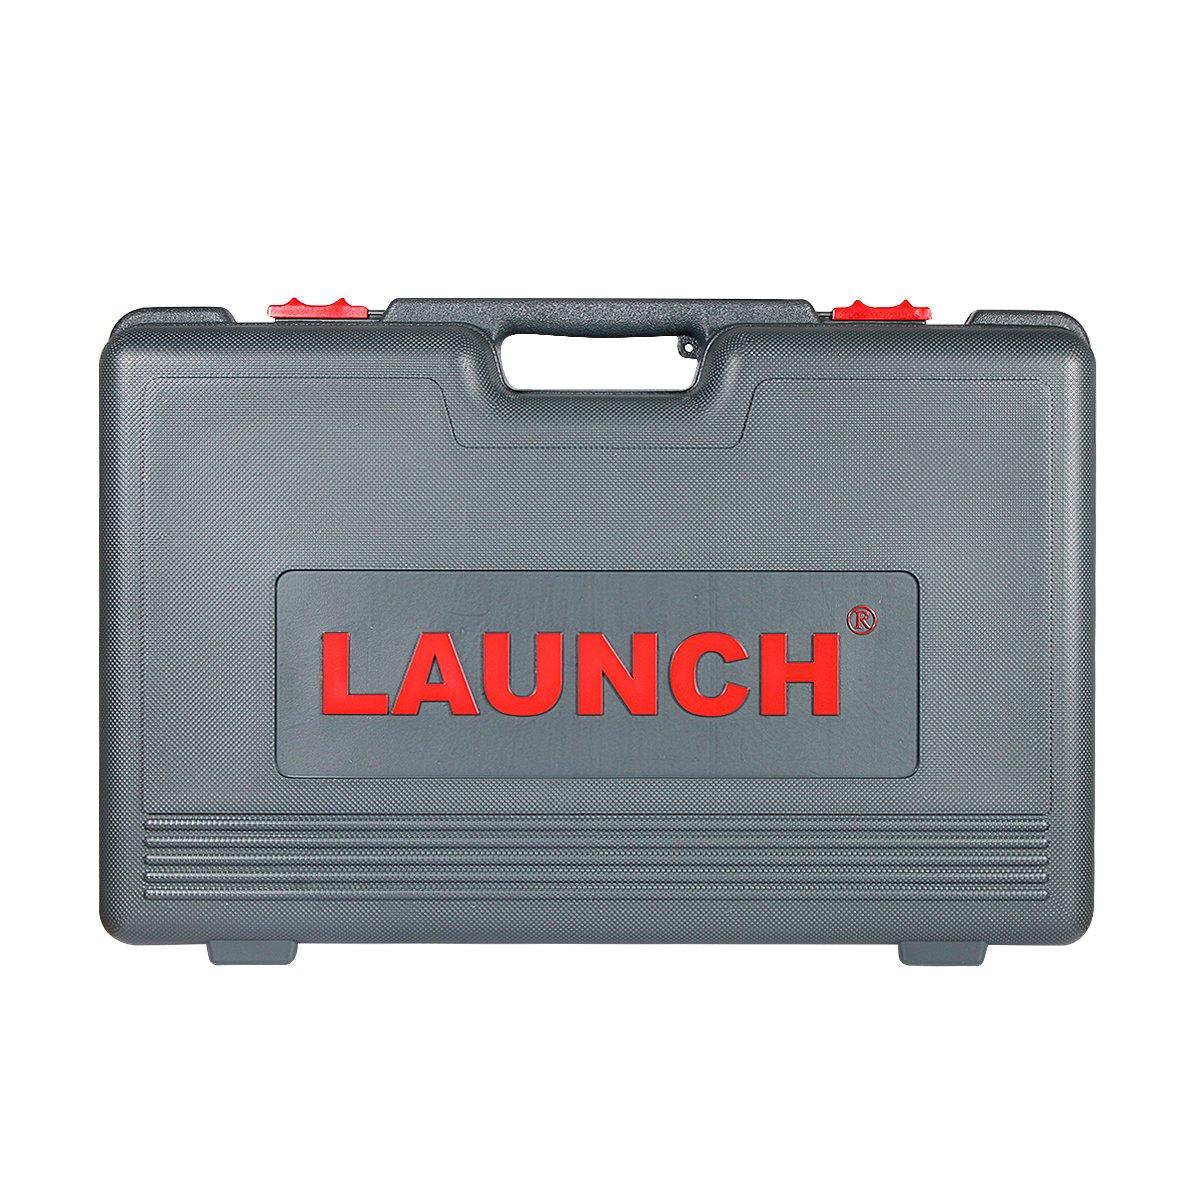 LAUNCH X431 HD Heavy Duty Truck Diagnostic Module X431 V+, X431 Pro3 V2.0 by LAUNCH (Image #8)